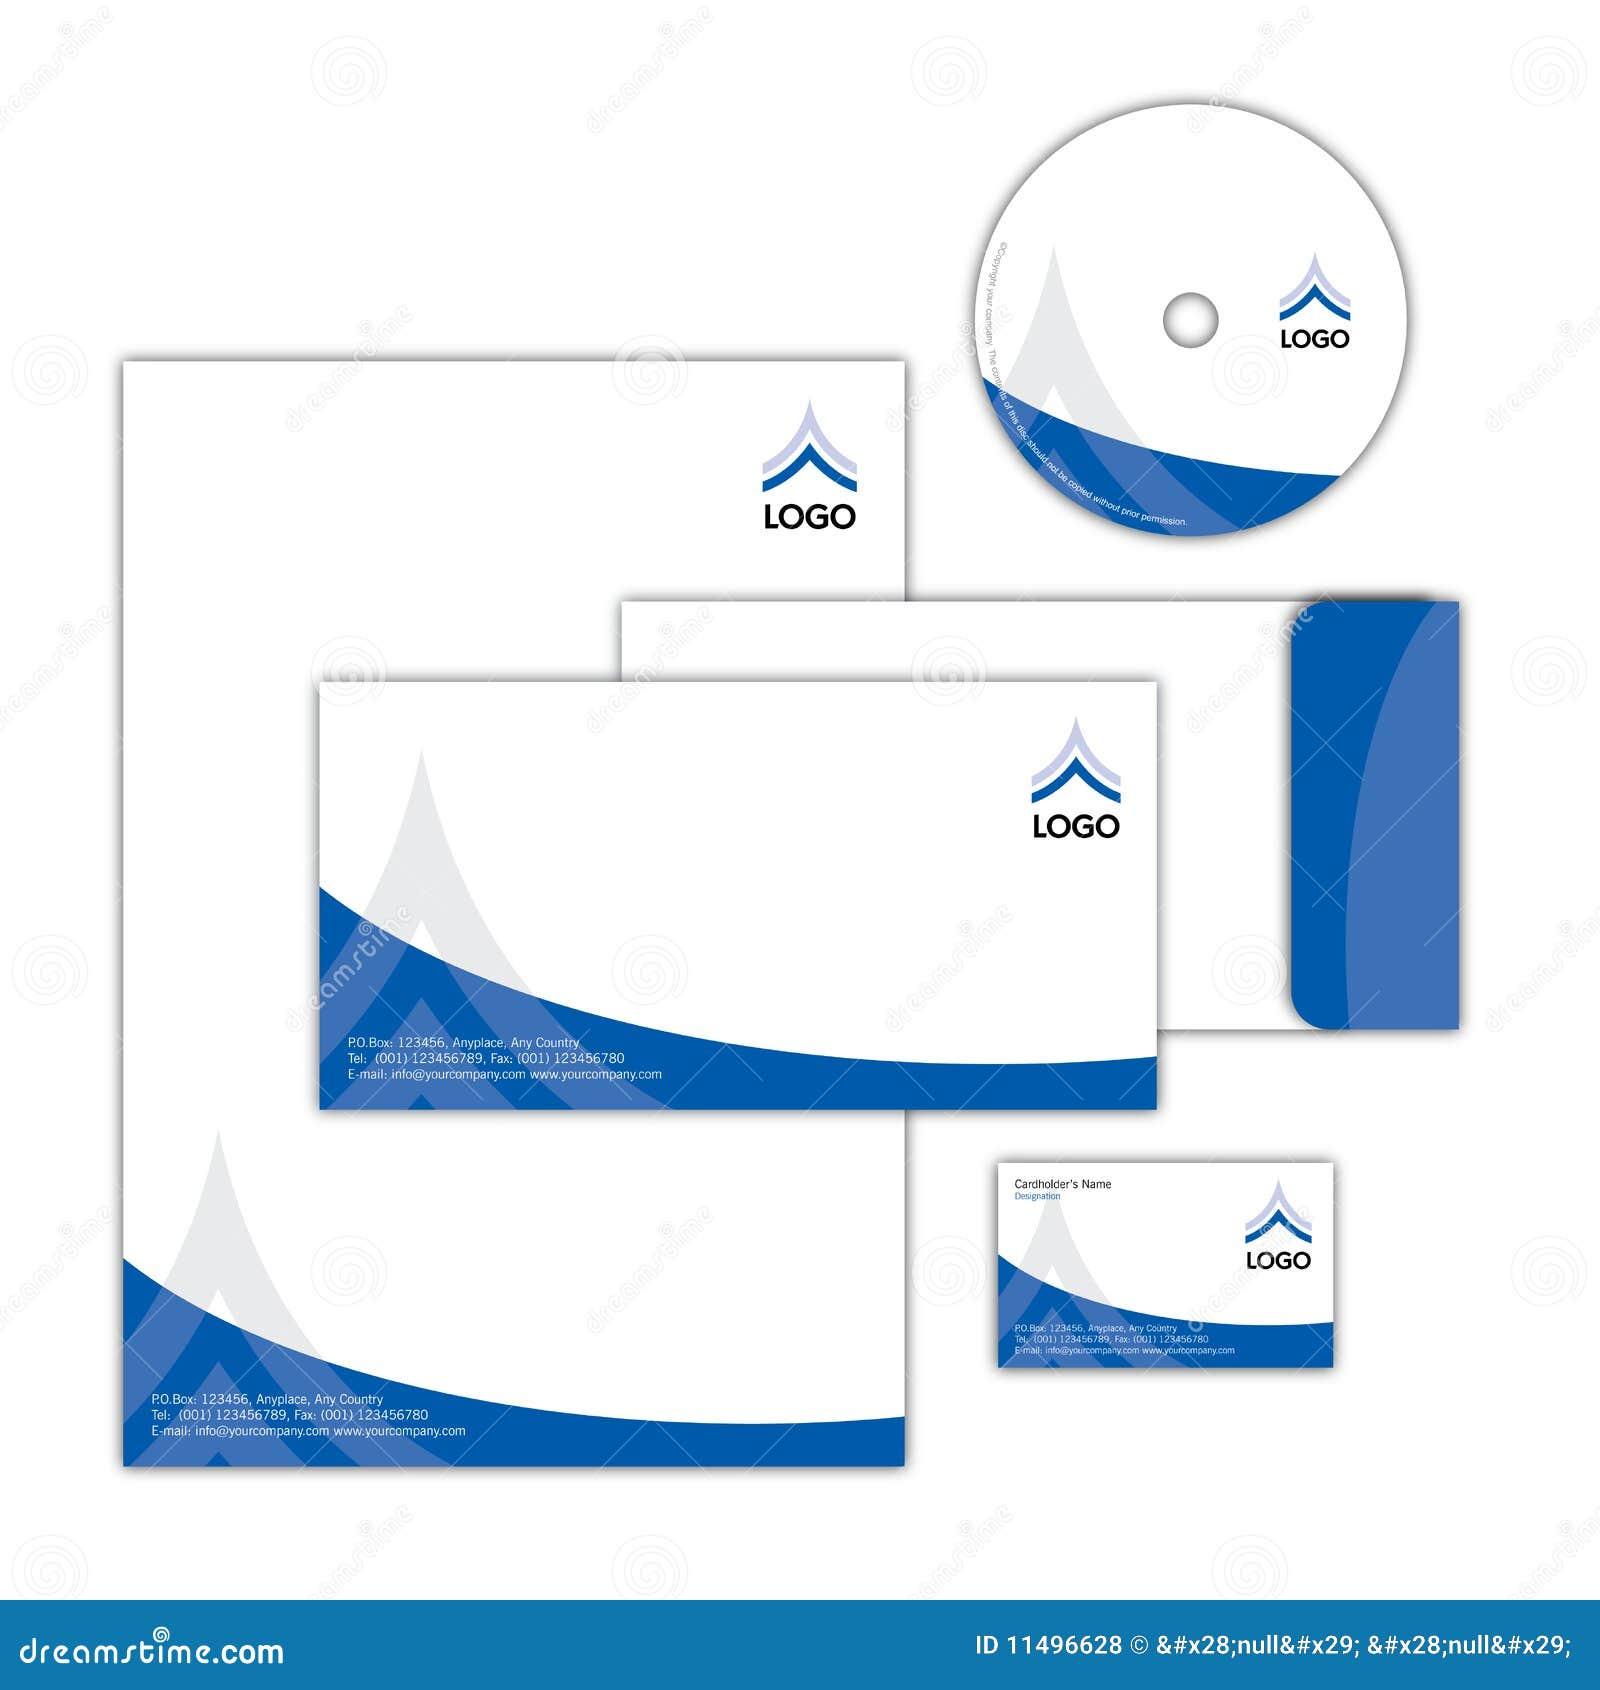 Corporate Identity Design 002